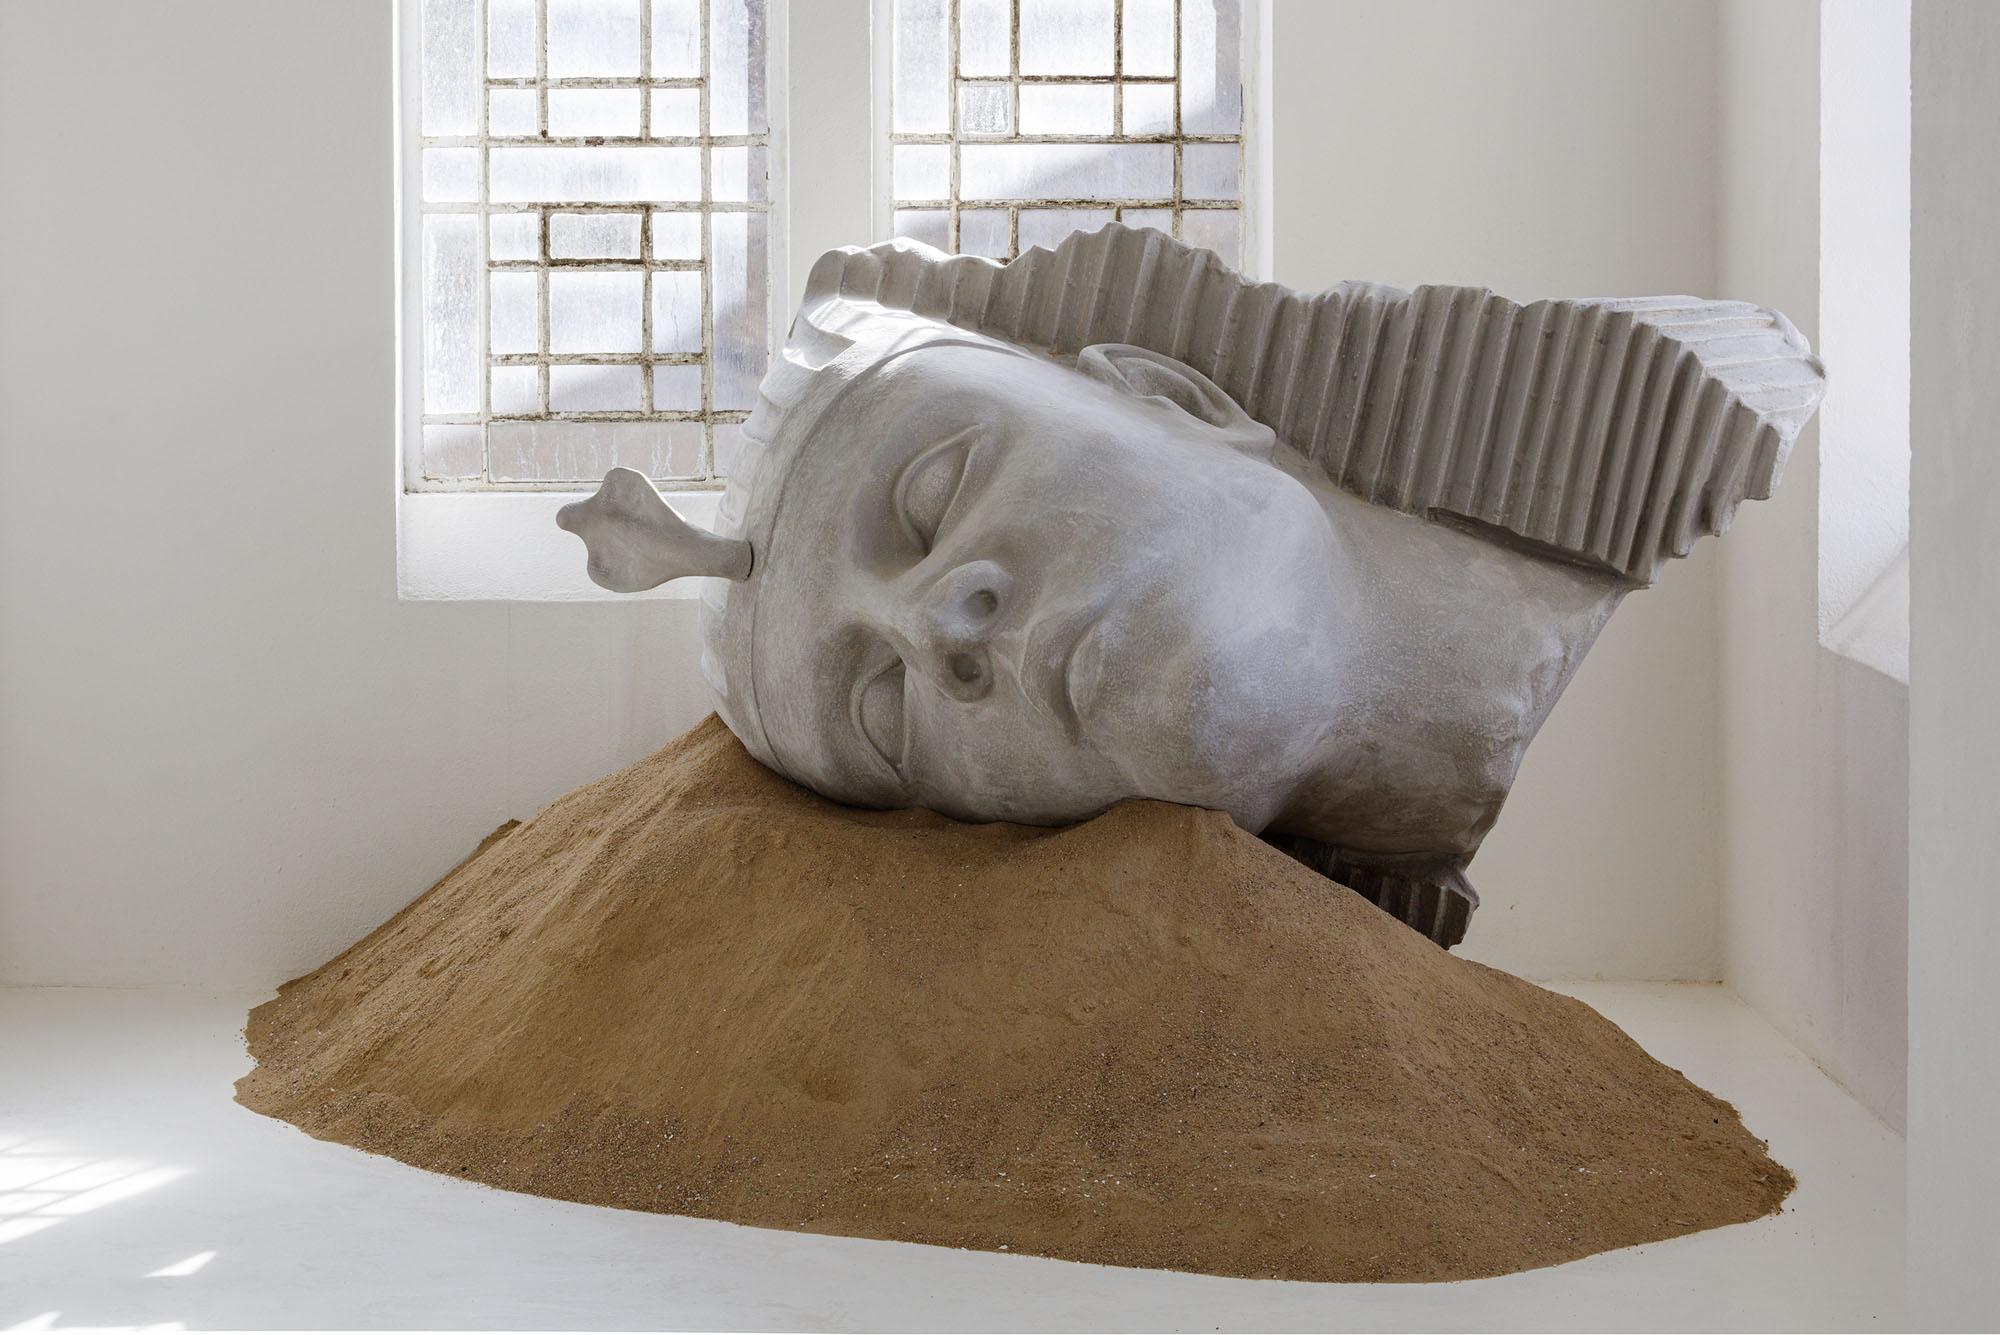 "Zuzanna Czebatul, Their New Power (Head), 2020. Πολυαιθυλένιο, ακρυλικό και άμμος, 150 x 240 x 170 εκ. Άποψη από την έκθεση ""The Singing Dunes of Zuzanna Czebatul"", CAC-La synagogue de Delme, 2020. Φωτογραφία: O.H. Dancy. Παραχώρηση της καλλιτέχνιδας."